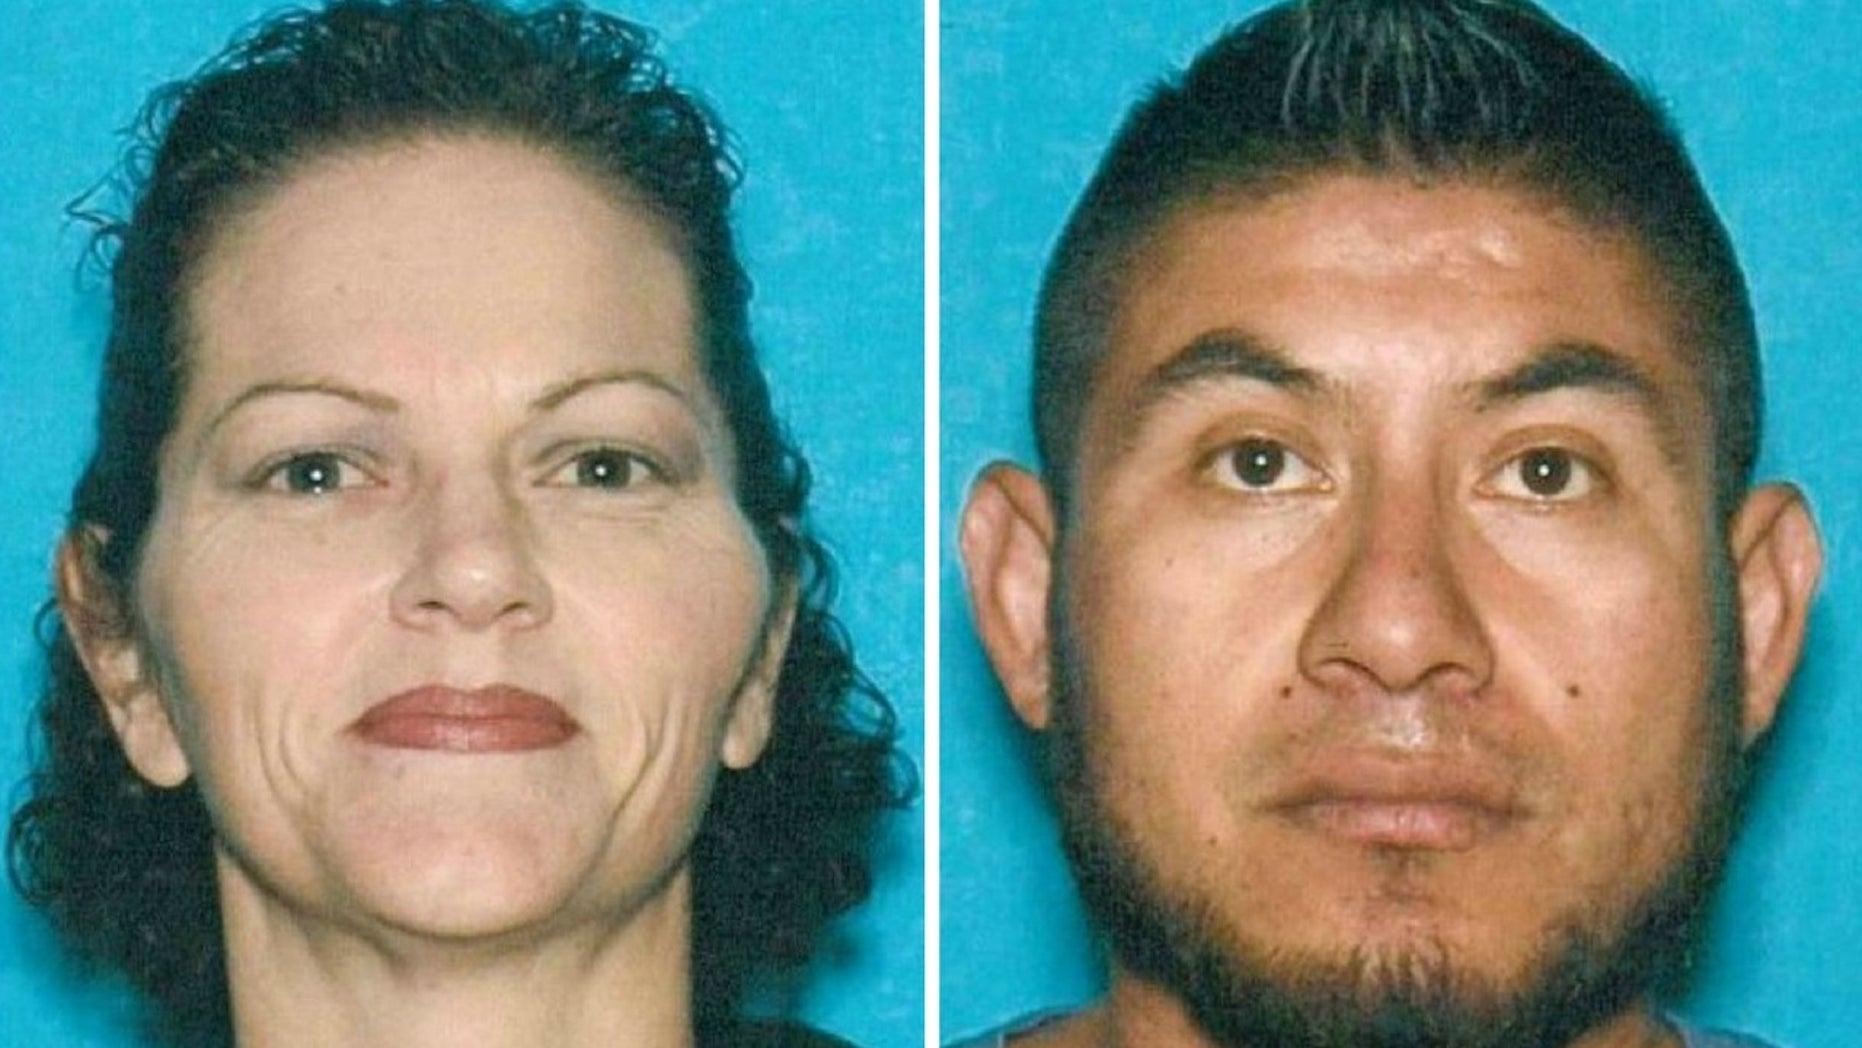 Stacie Mendoza and Jose Mendoza are accused of killing a Vietnam War veteran before burning his body, police said.